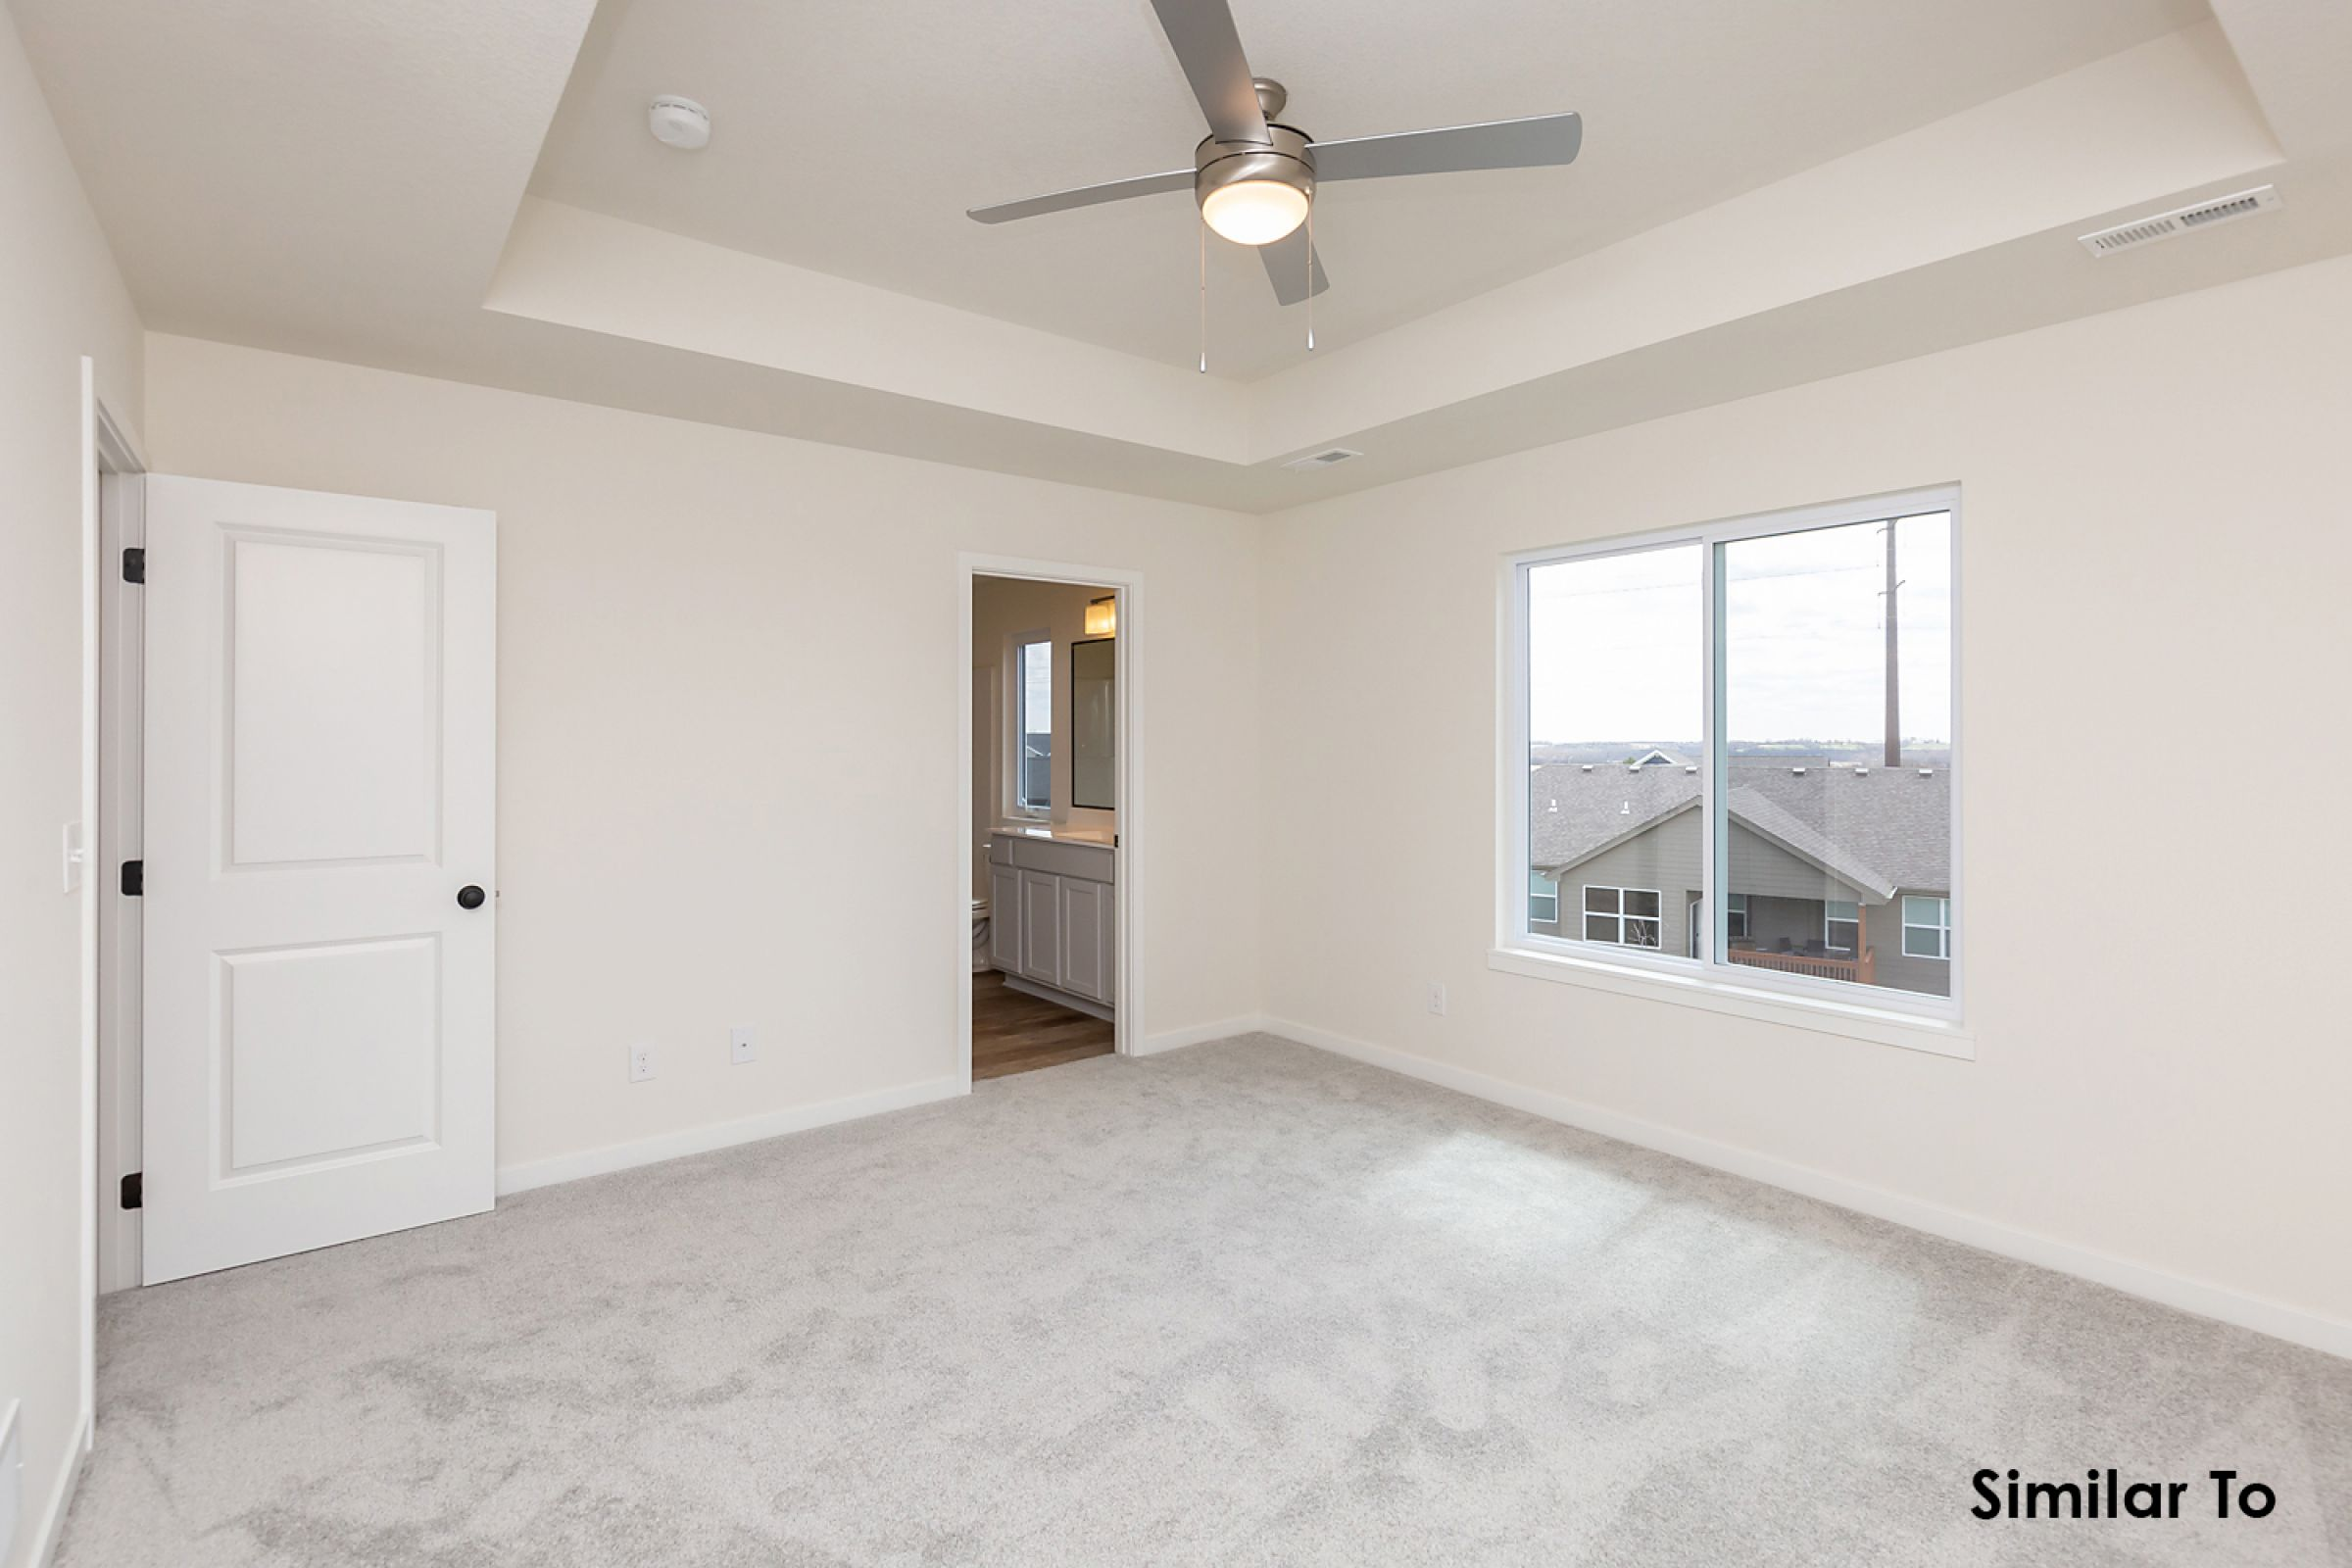 residential-warren-county-iowa-0-acres-listing-number-15138-12-2020-08-28-172757.jpg